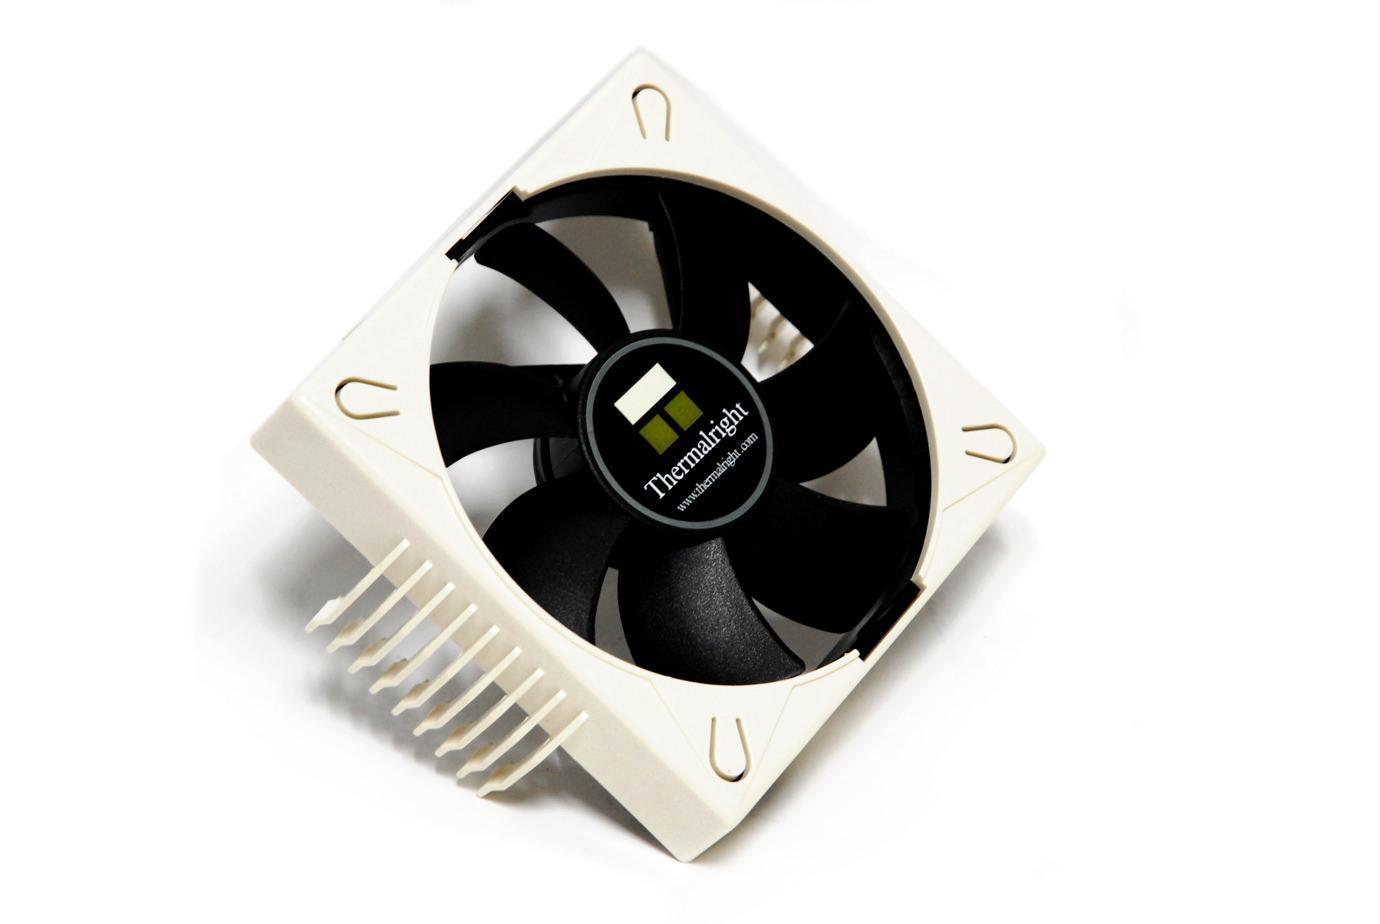 Thermalright Venomous X-RT - тот же кулер, но с поддержкой платформ AMD AM2/AM3